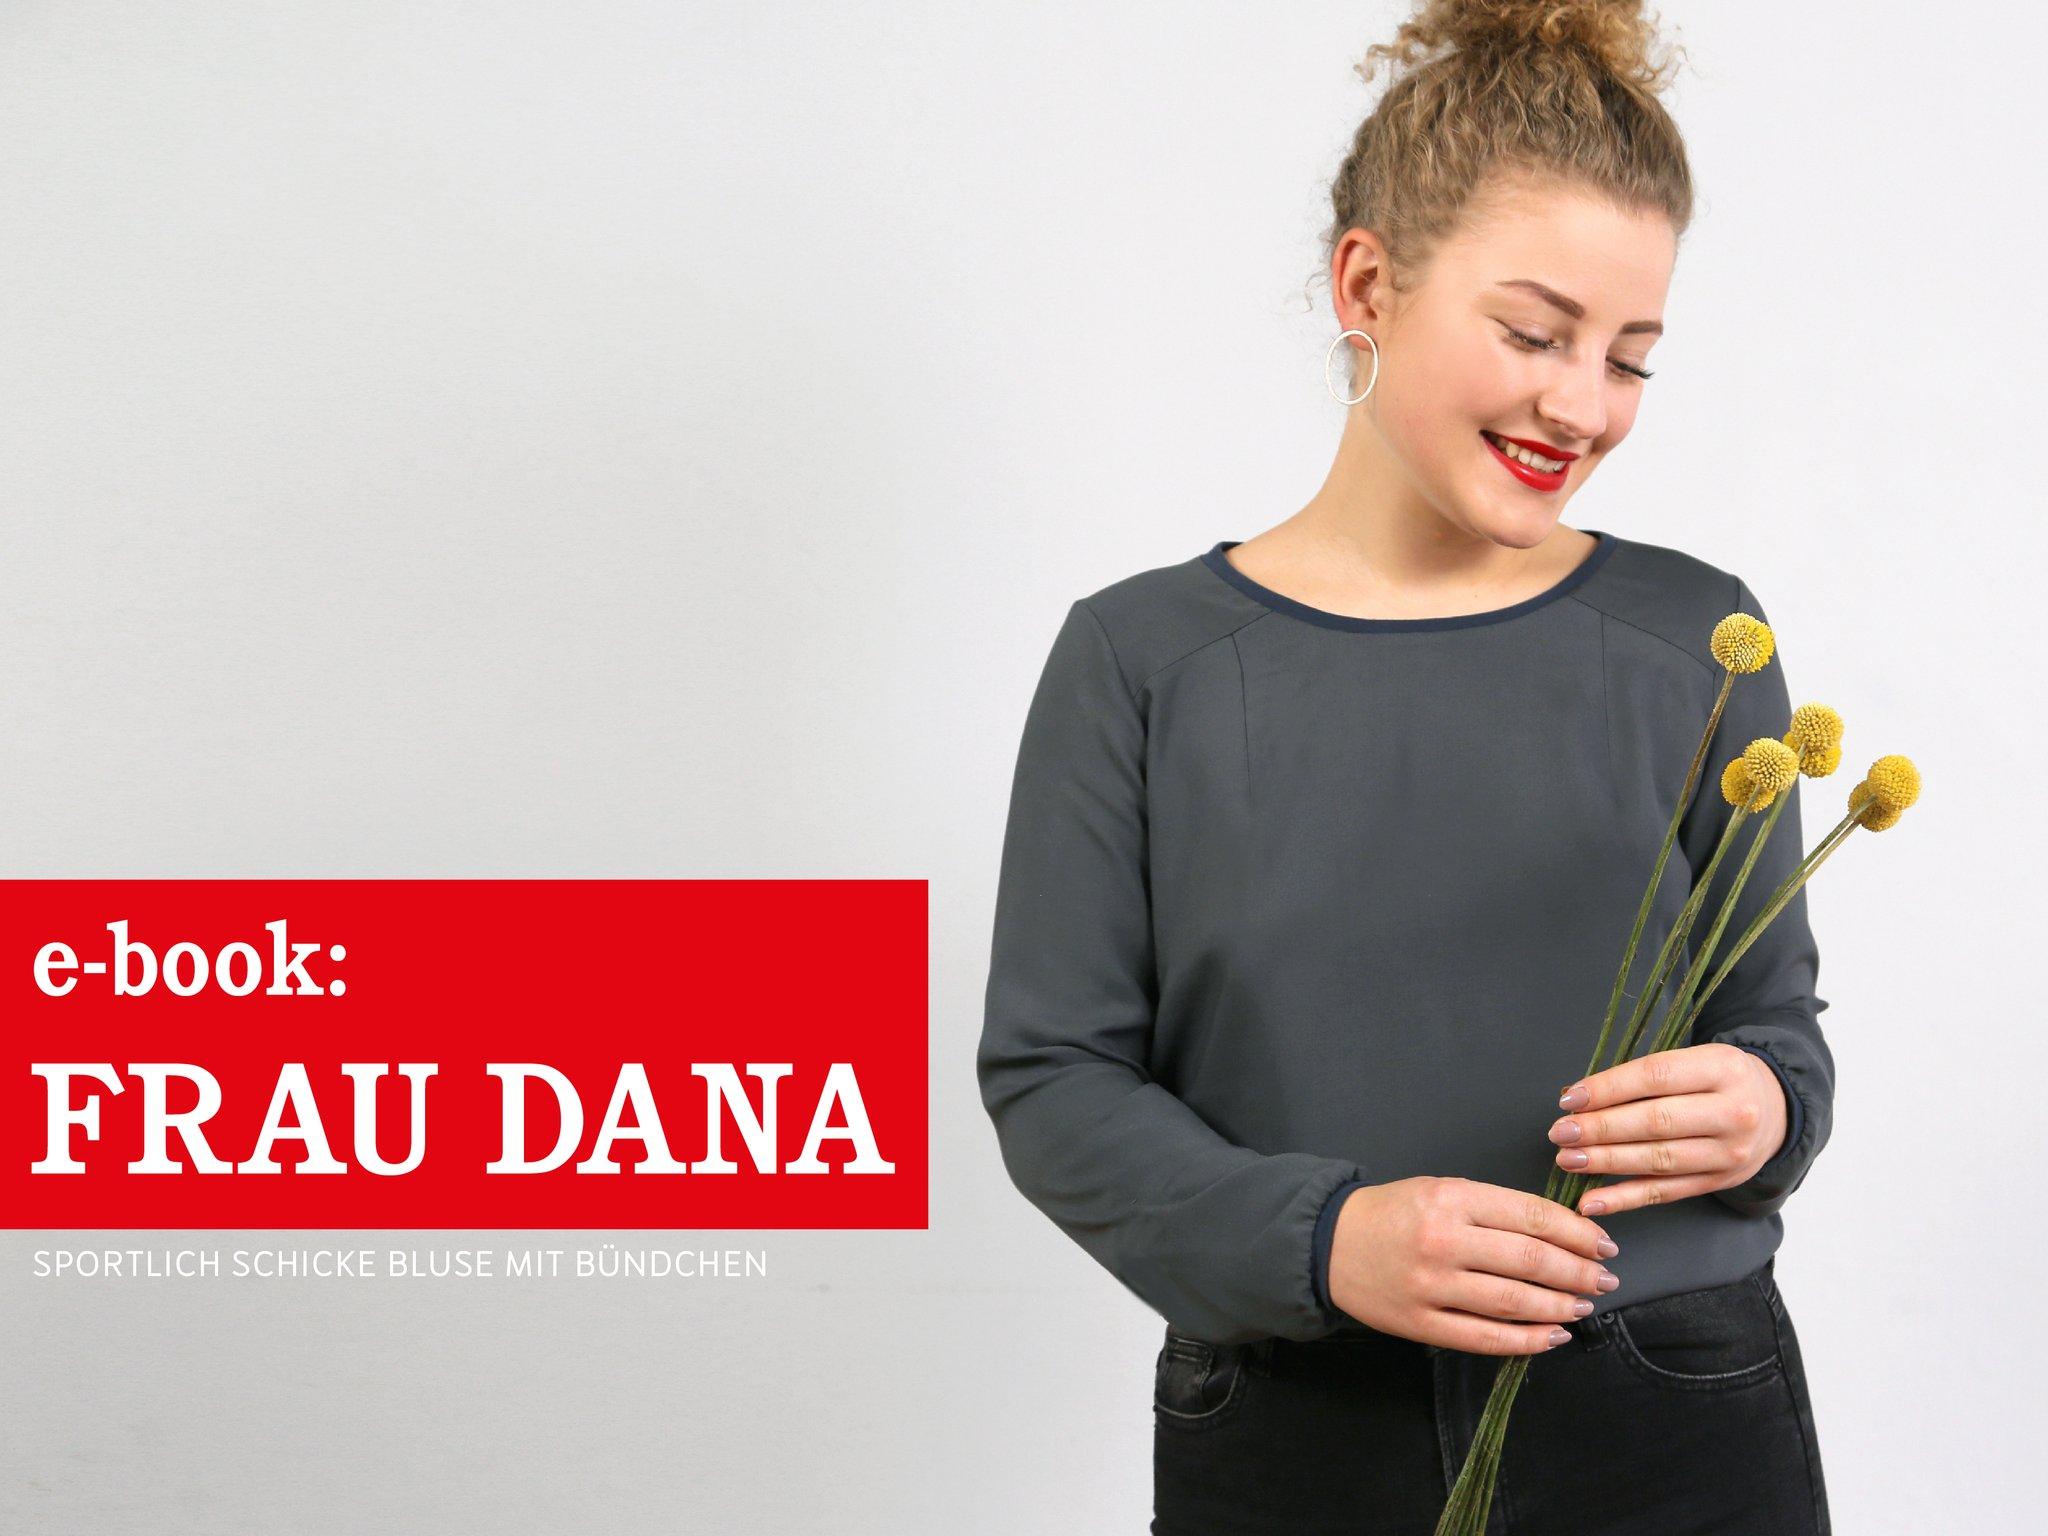 FRAU DANA Bluse mit Halslochbündchen, e-book